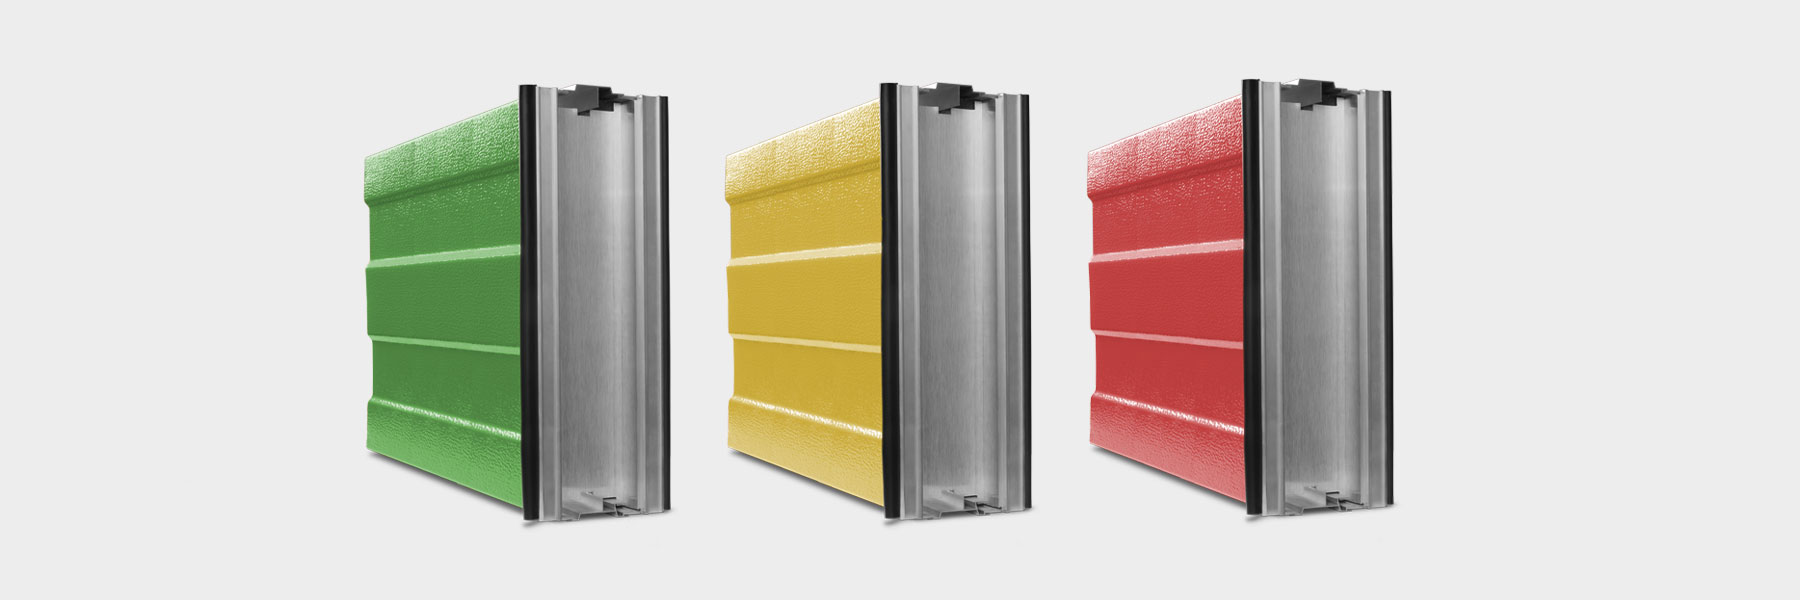 tooldesign-web-hermanussen-profile-farbig